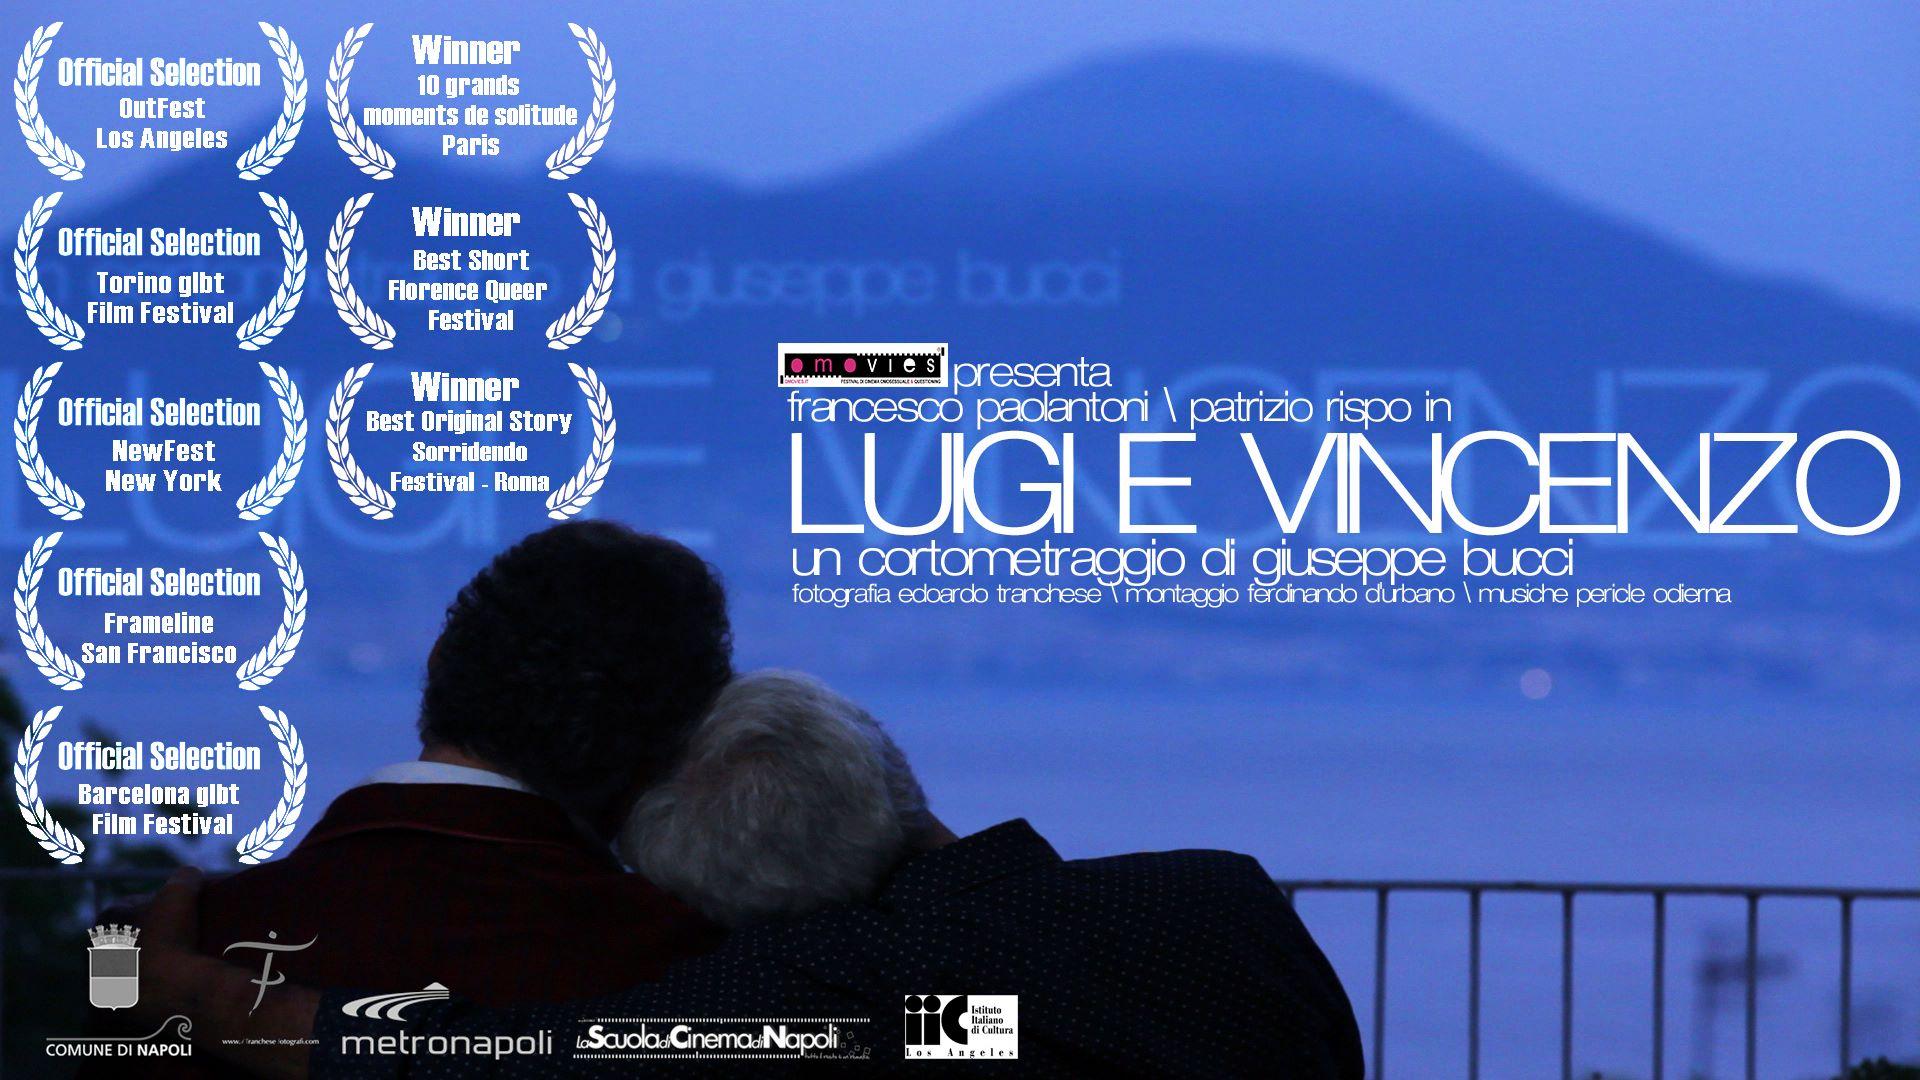 Luigi e Vincenzo